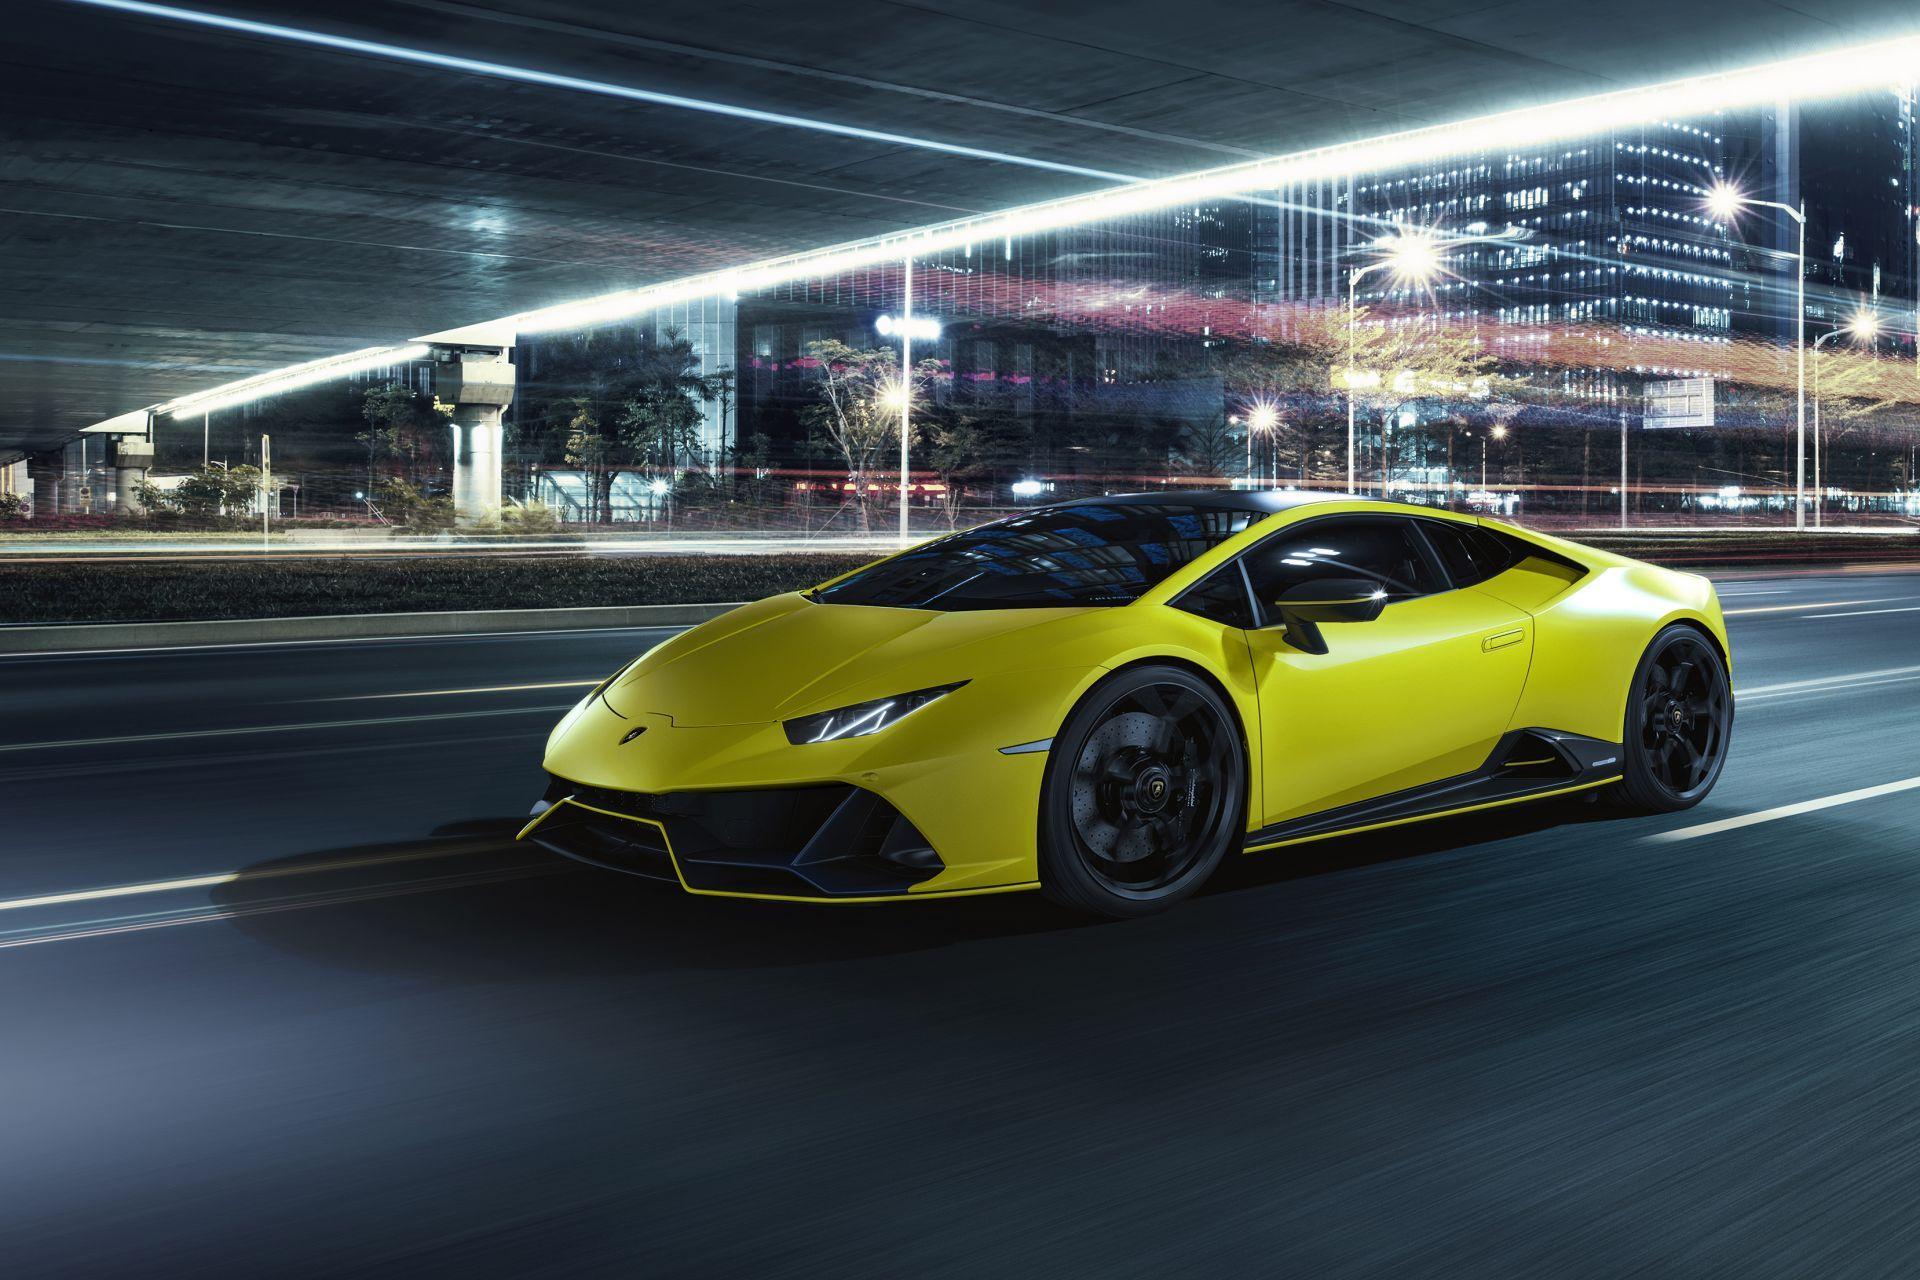 Lamborghini-Huracan-Evo-Fluo-Capsule-5